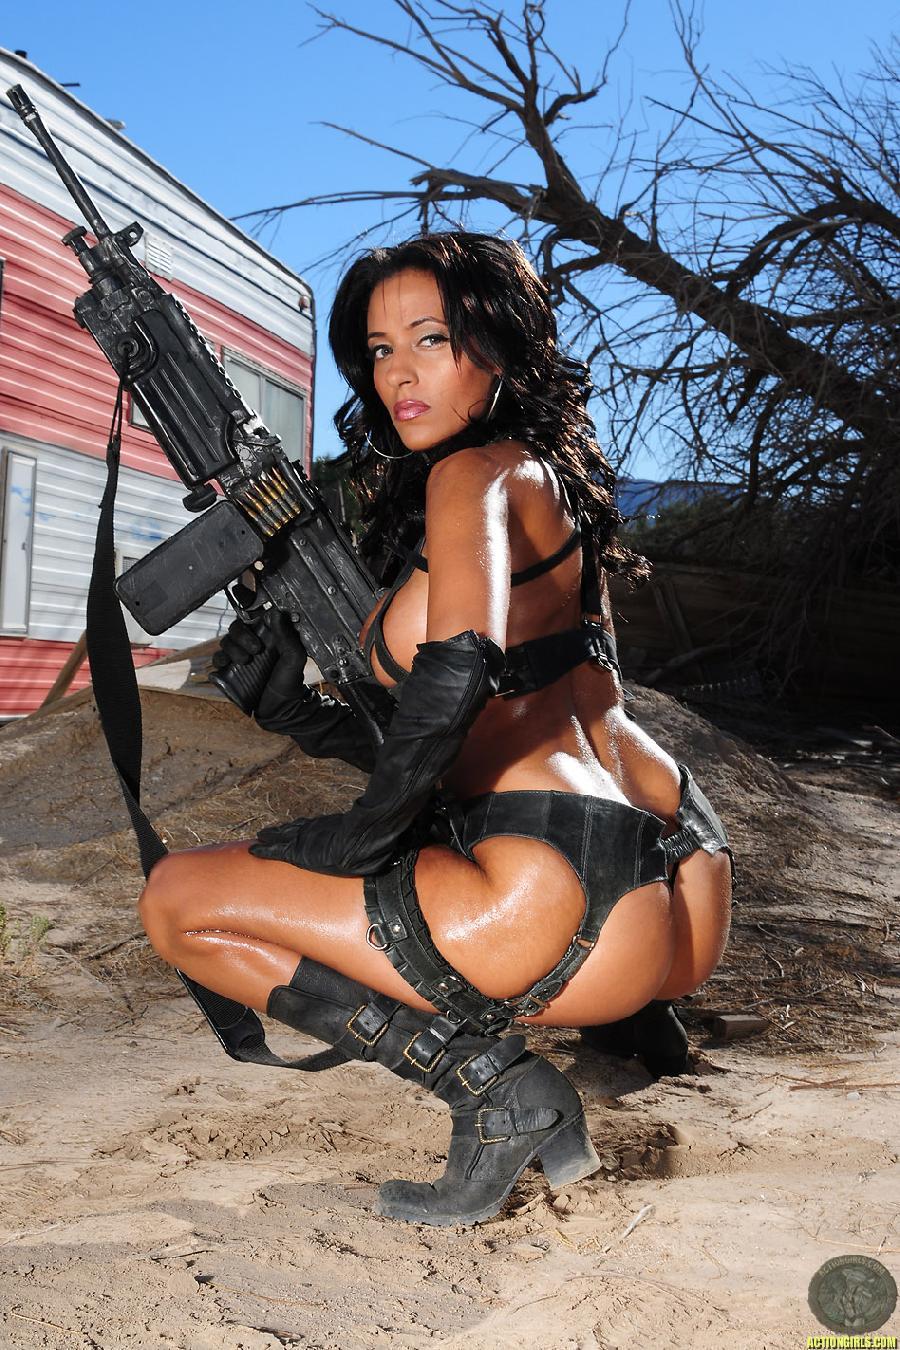 guns and sexy womennude